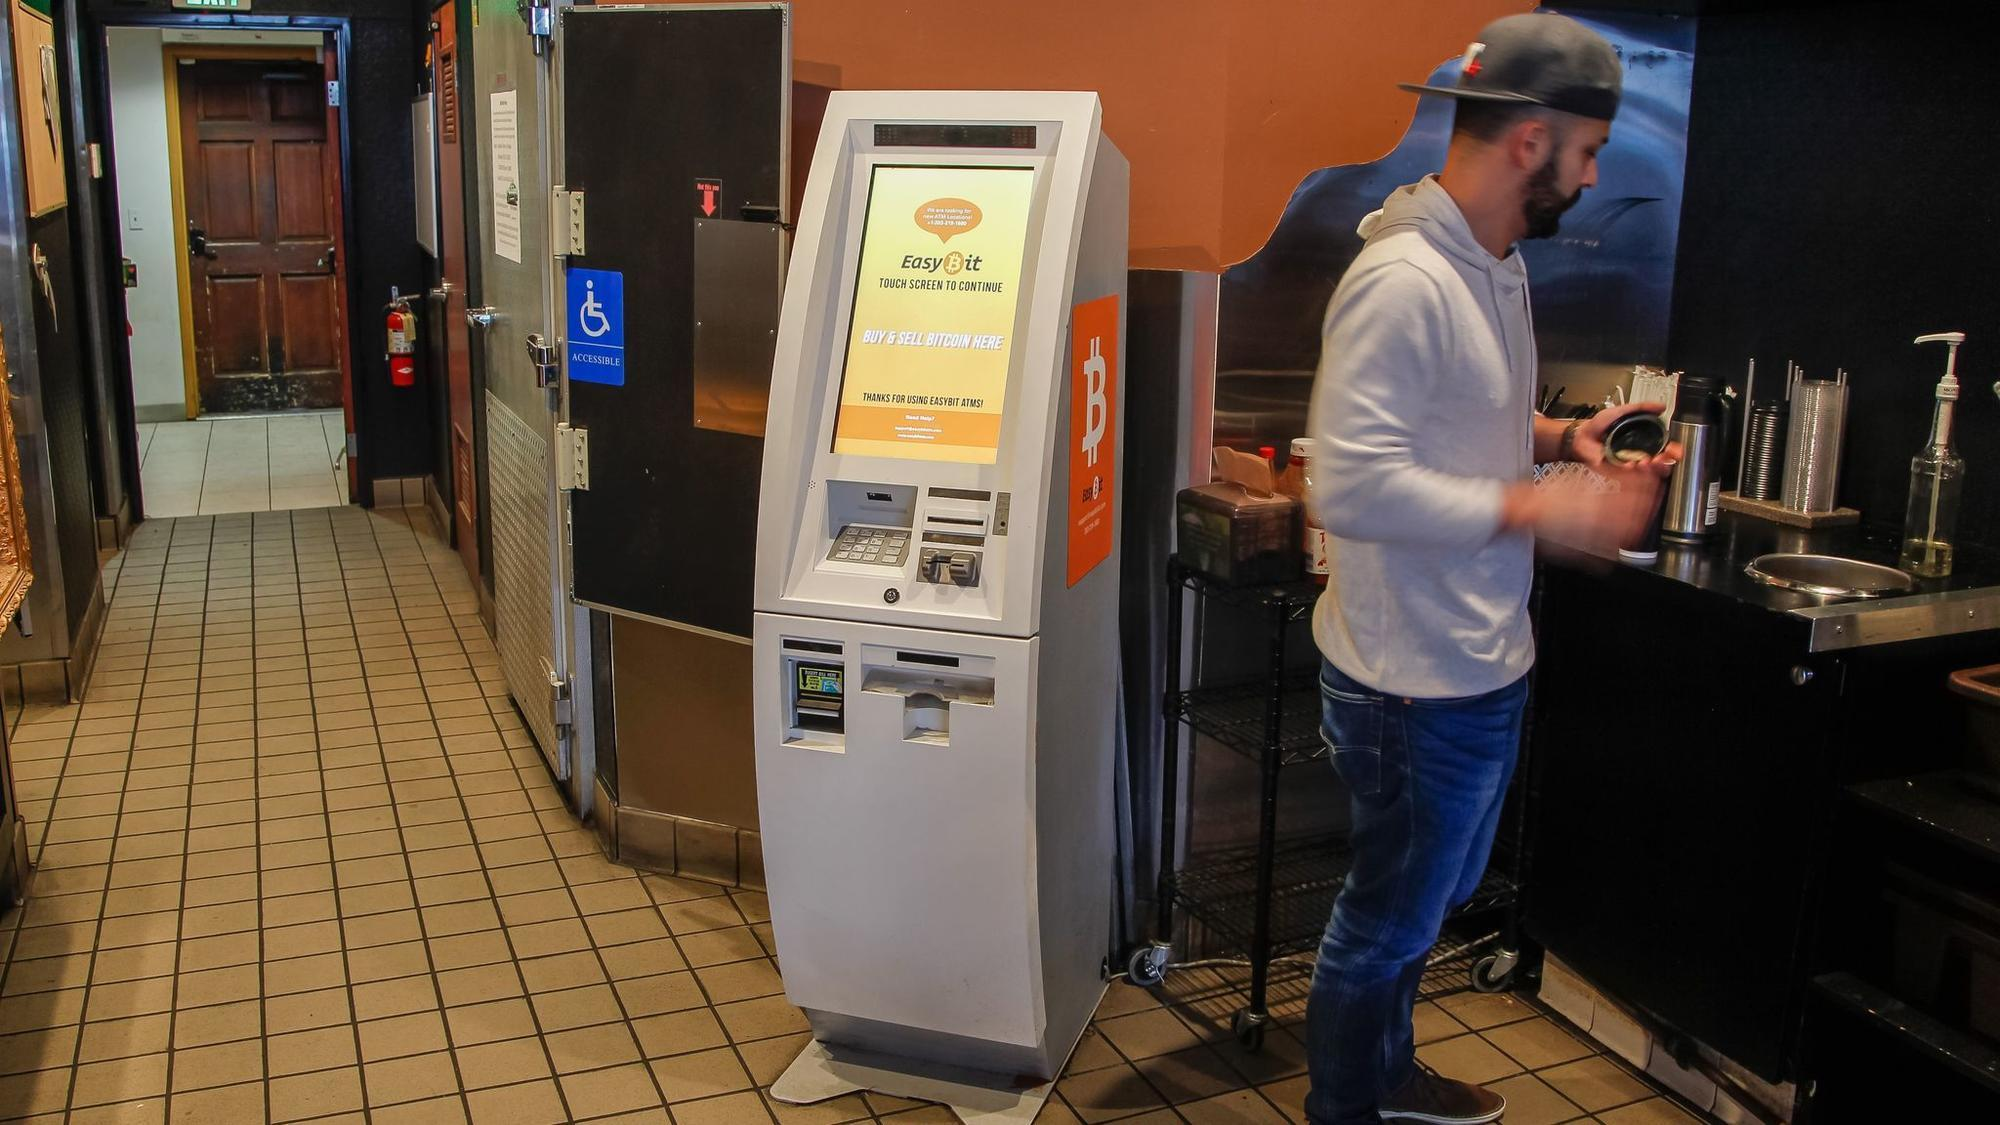 Bitcoin ATMs popping up around San Diego - The San Diego ...